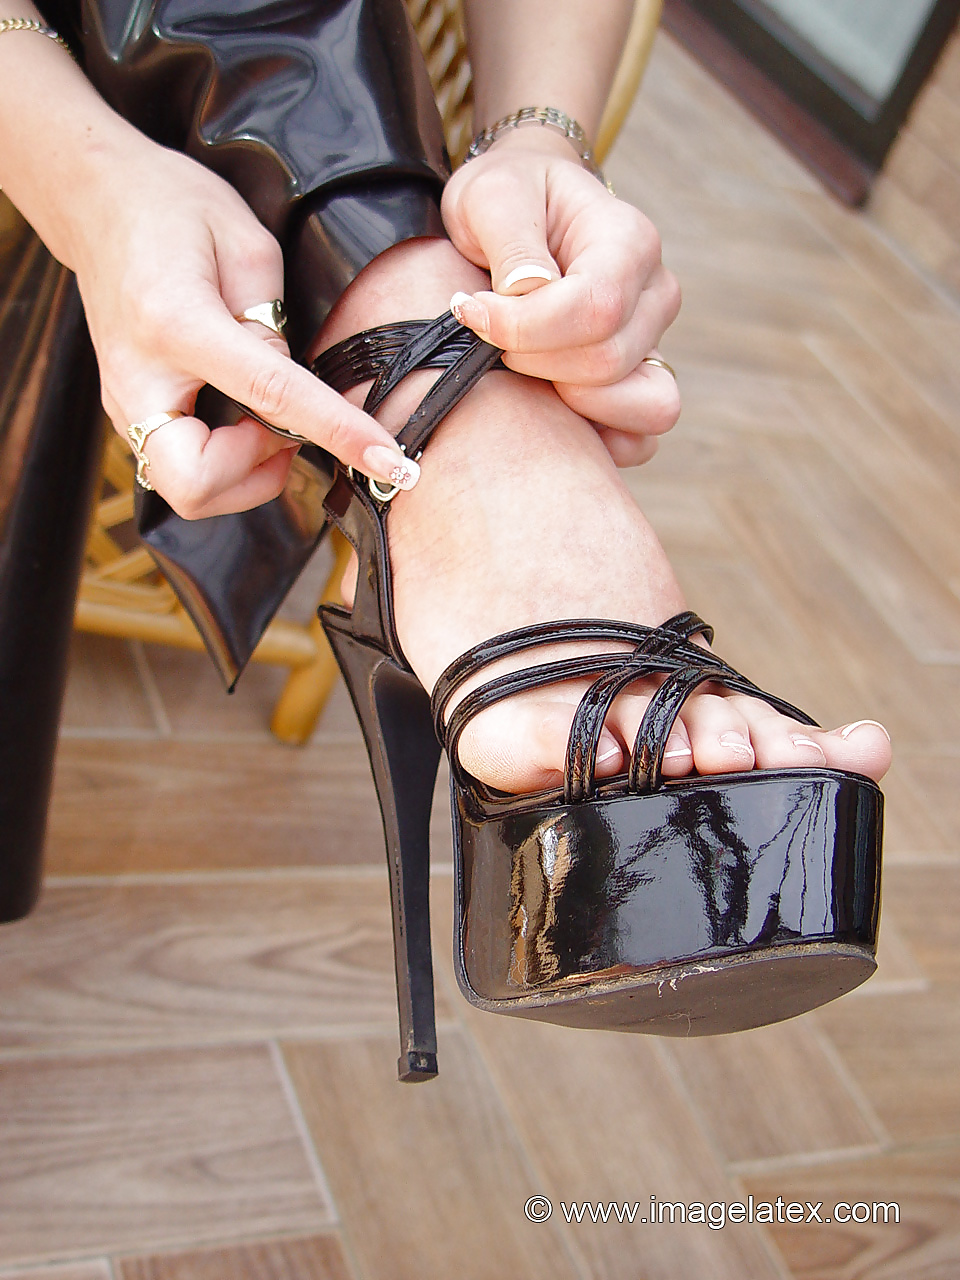 Fetish heel messy woman